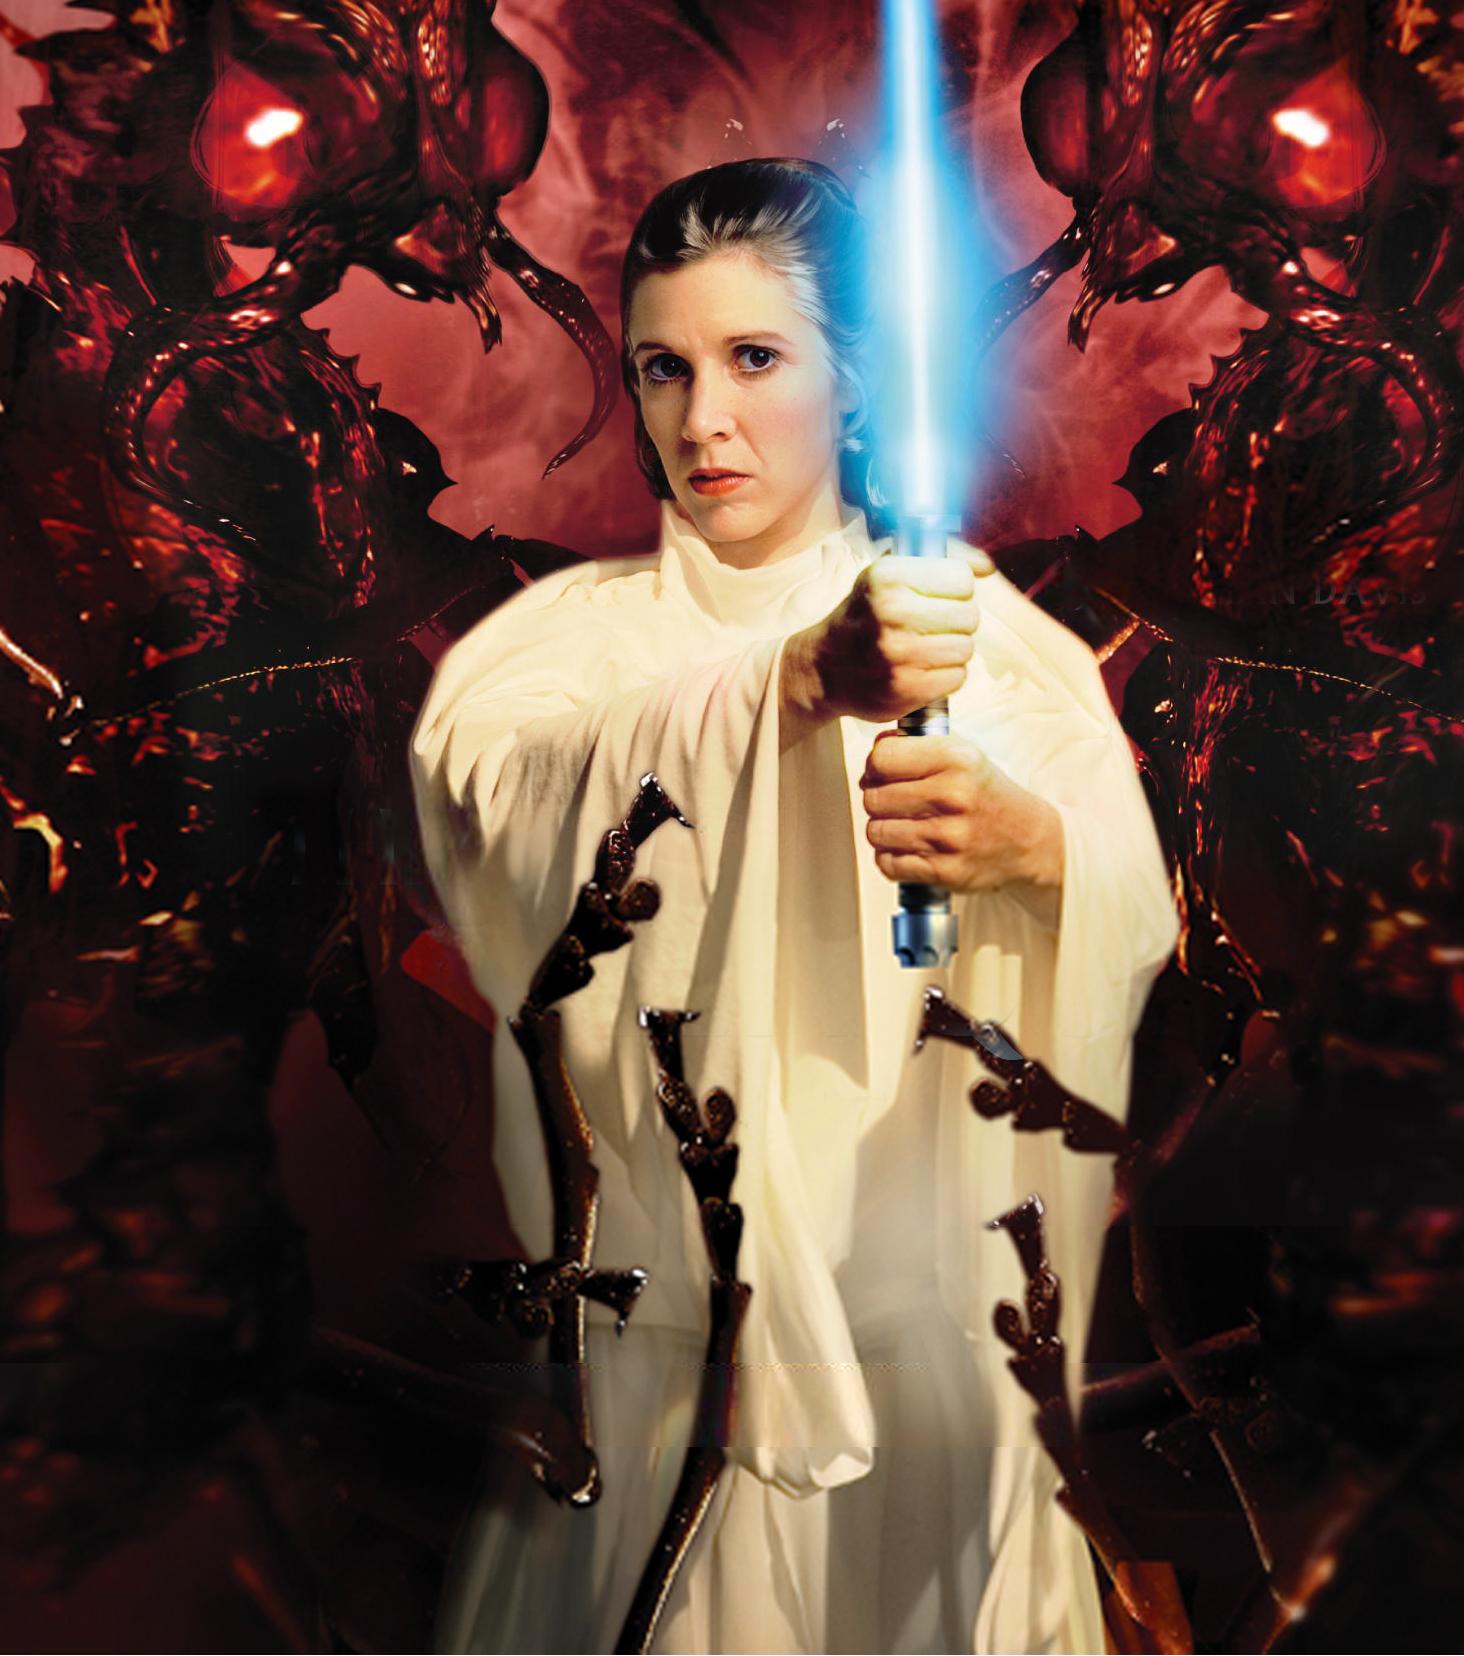 Leia Organa Solo's lightsabers